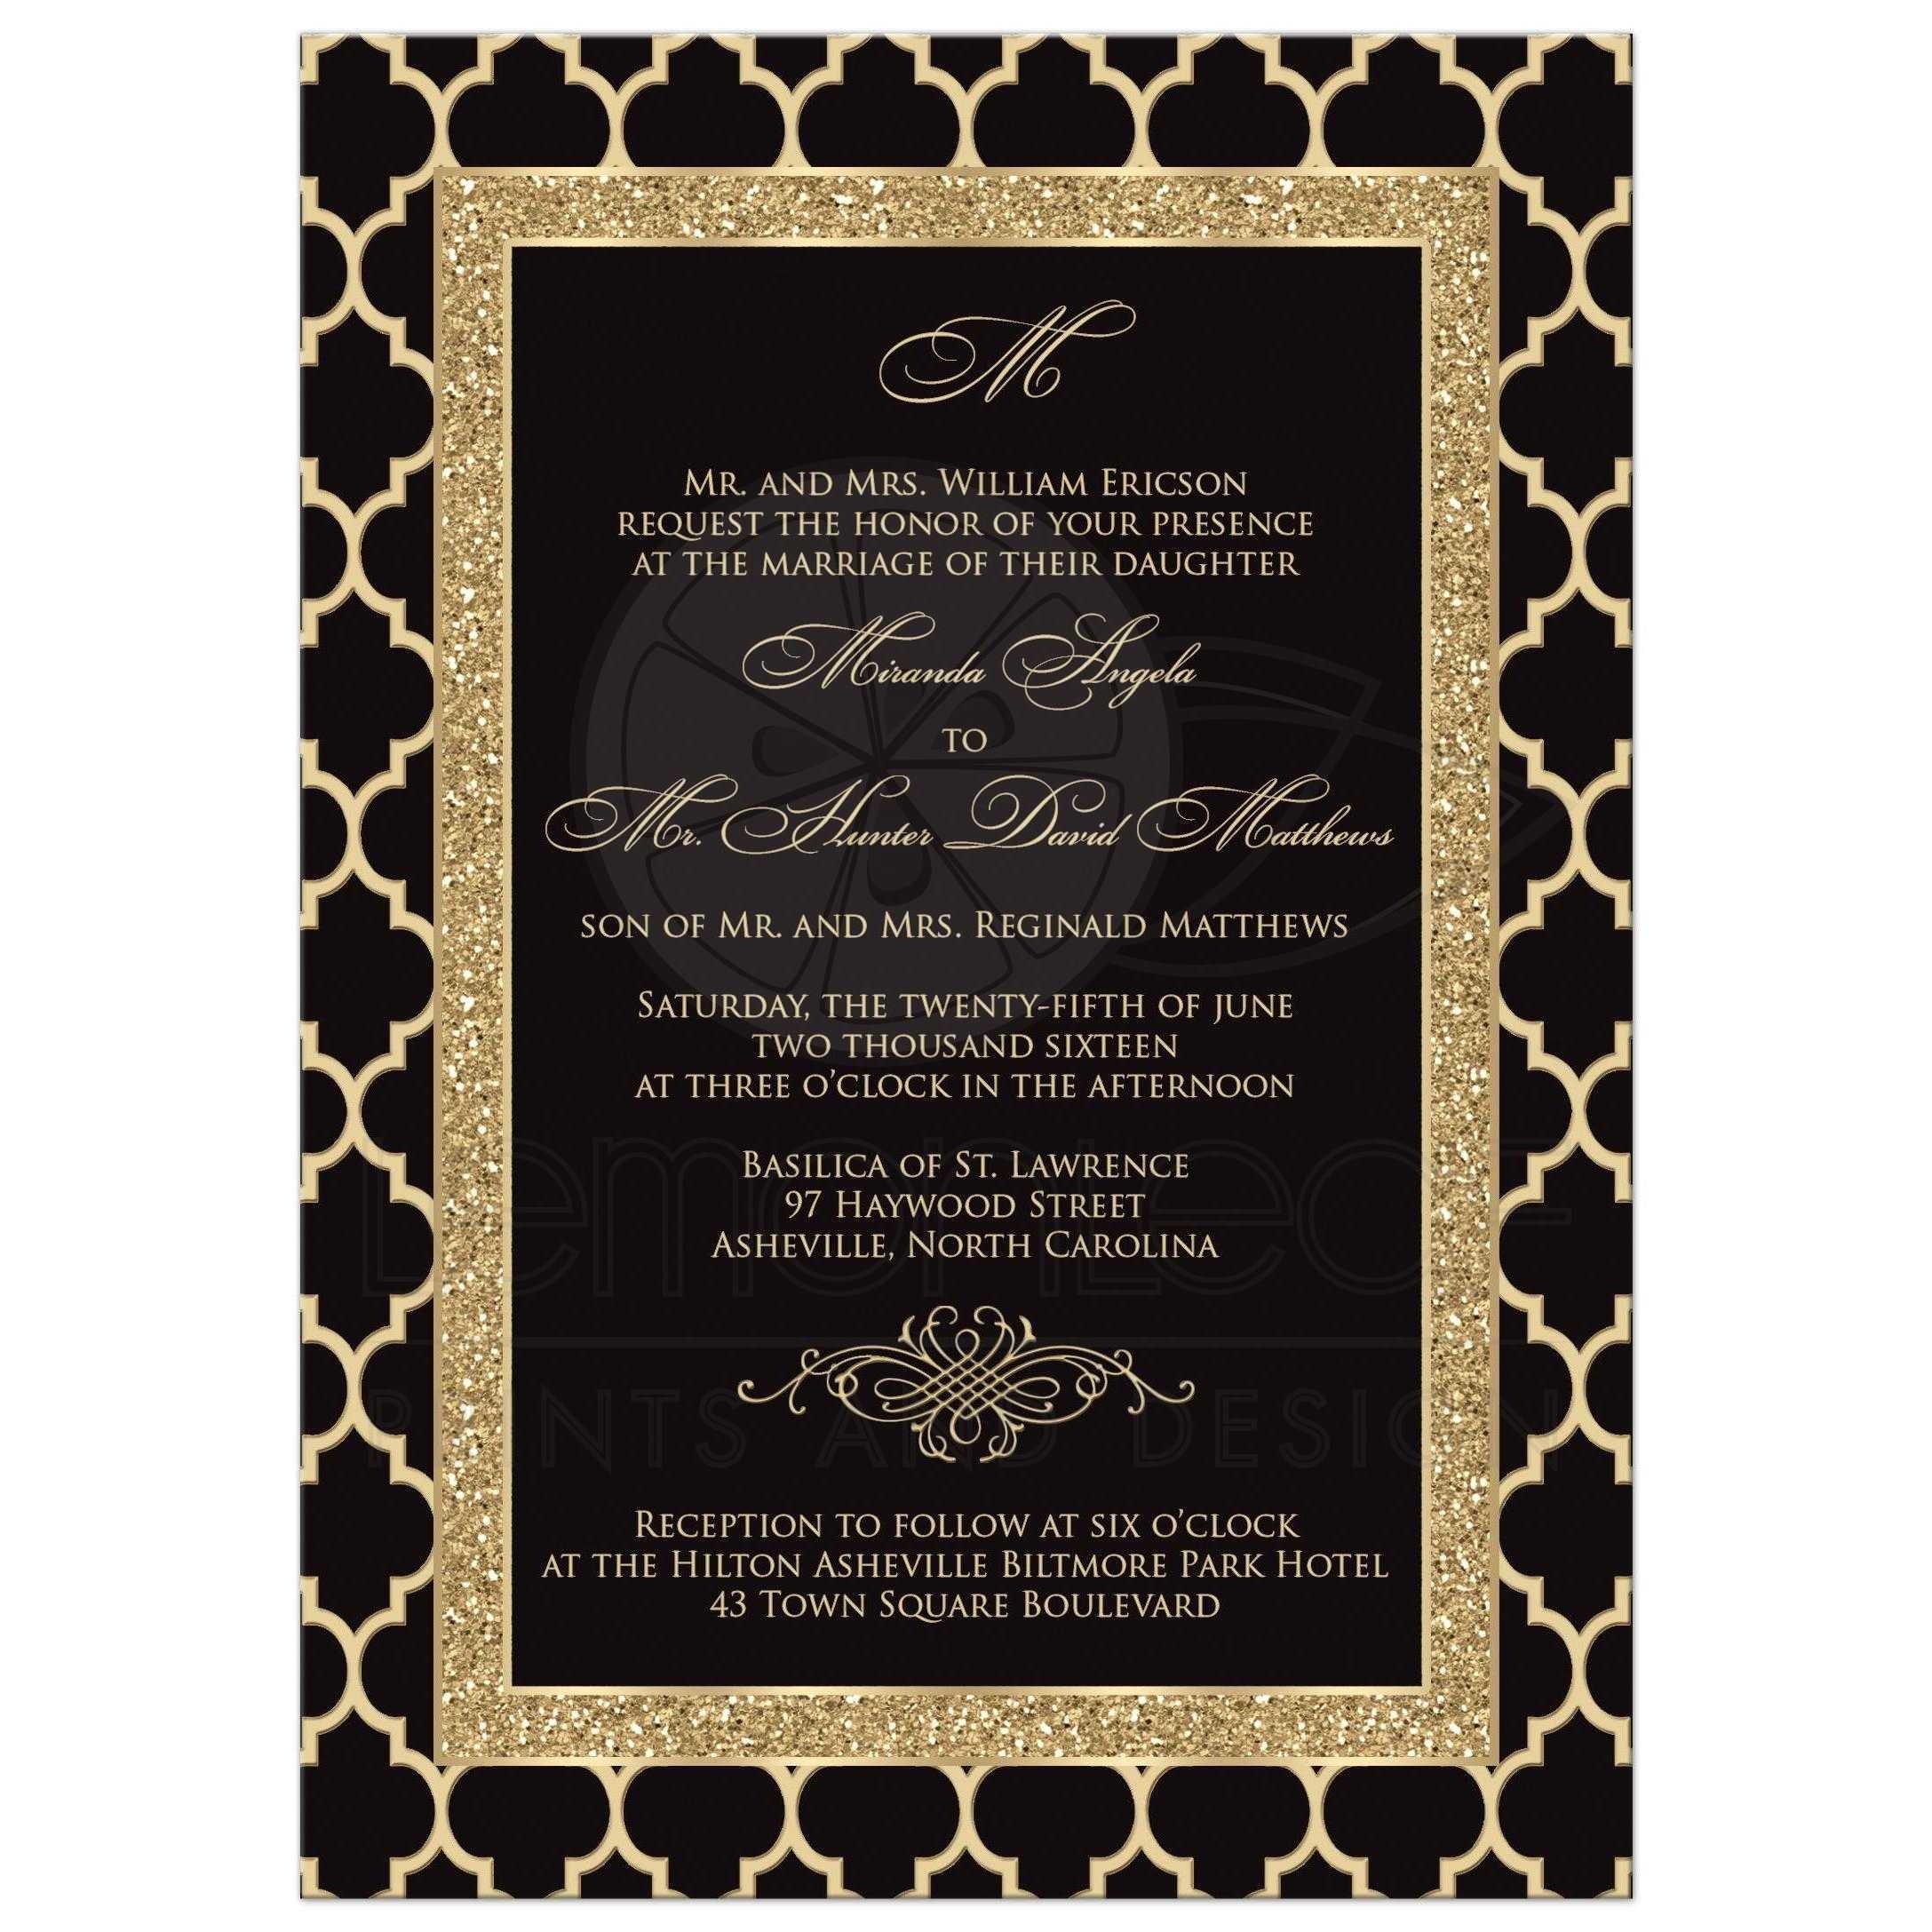 Black and Gold Invitation Template Monogrammed Wedding Invitation